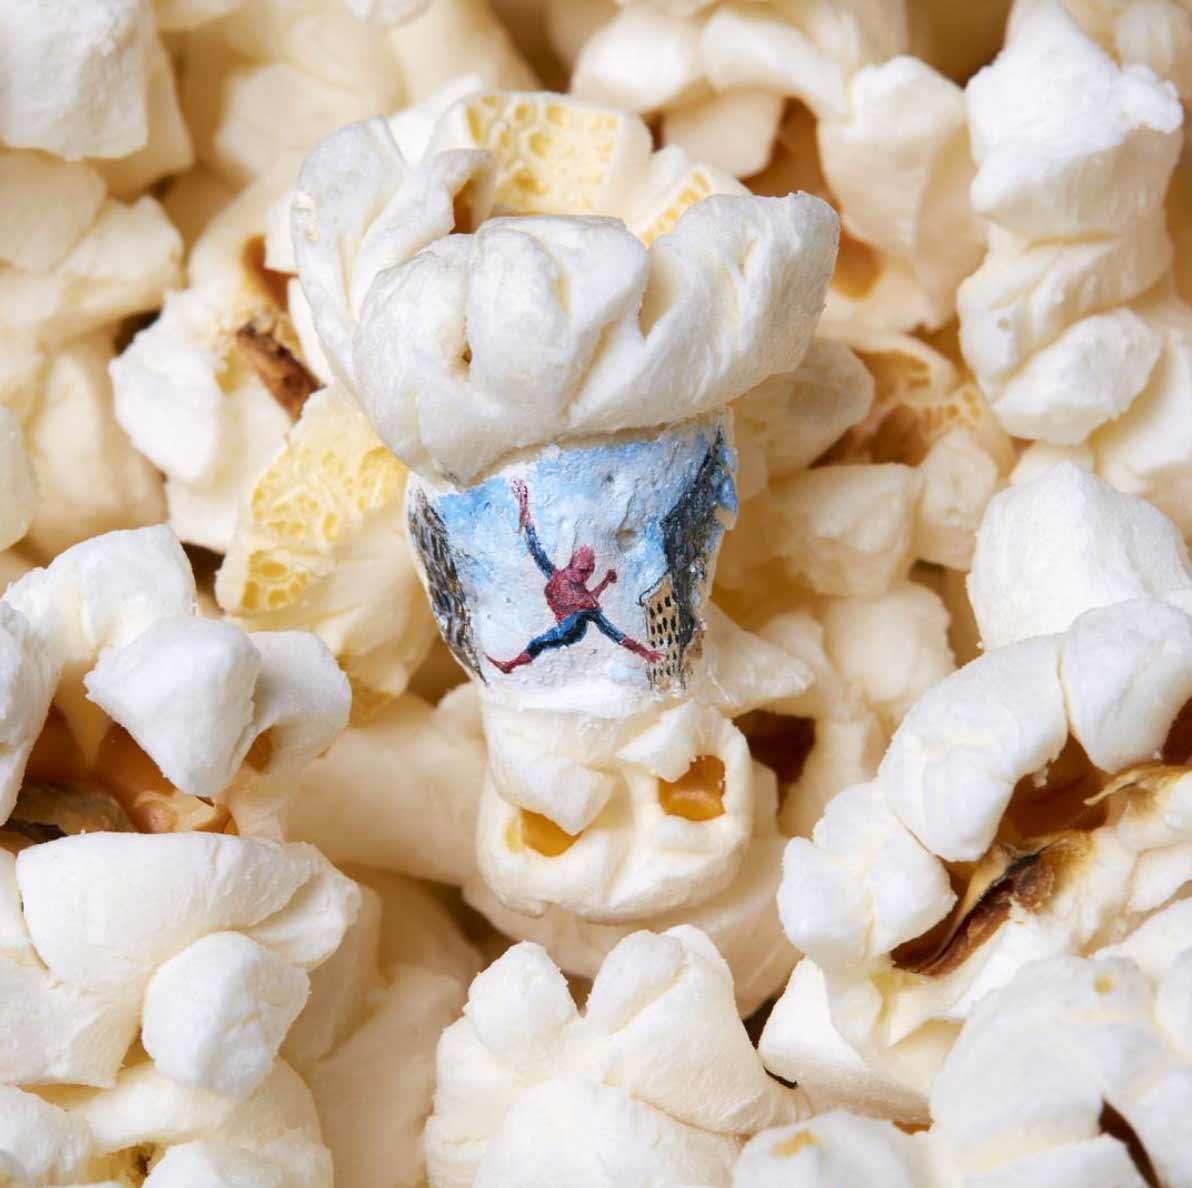 Filmmotive auf Popcorn gemalt Hasan-Kale-popcornmalerei_01